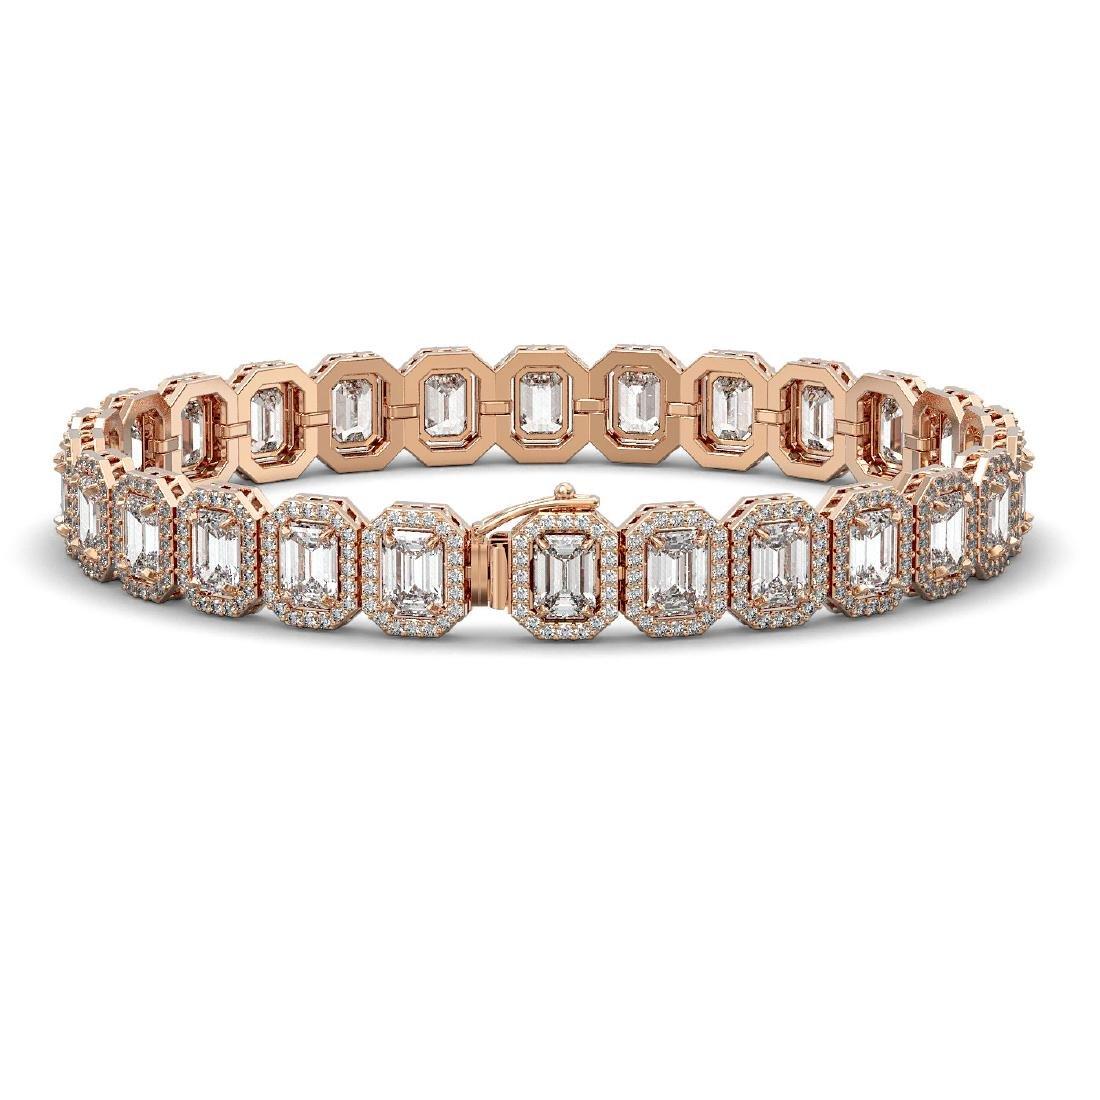 20.25 CTW Emerald Cut Diamond Designer Bracelet 18K - 2